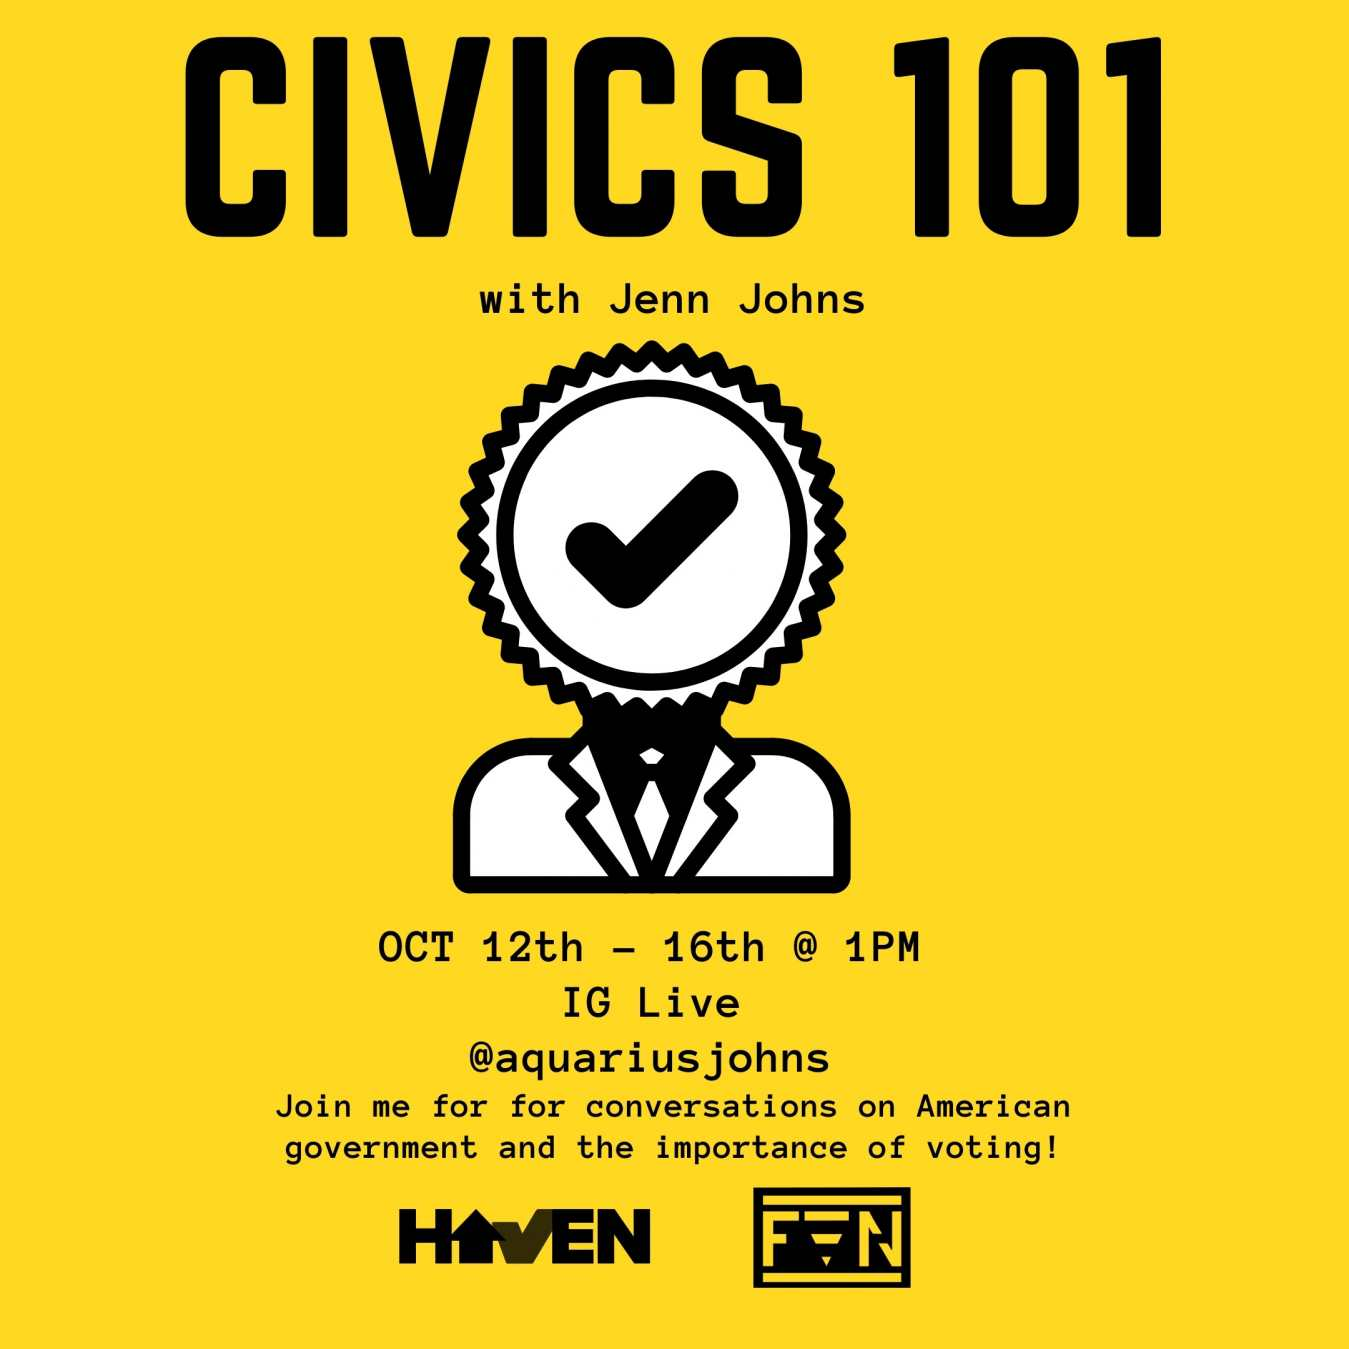 Civics 101 Flyer